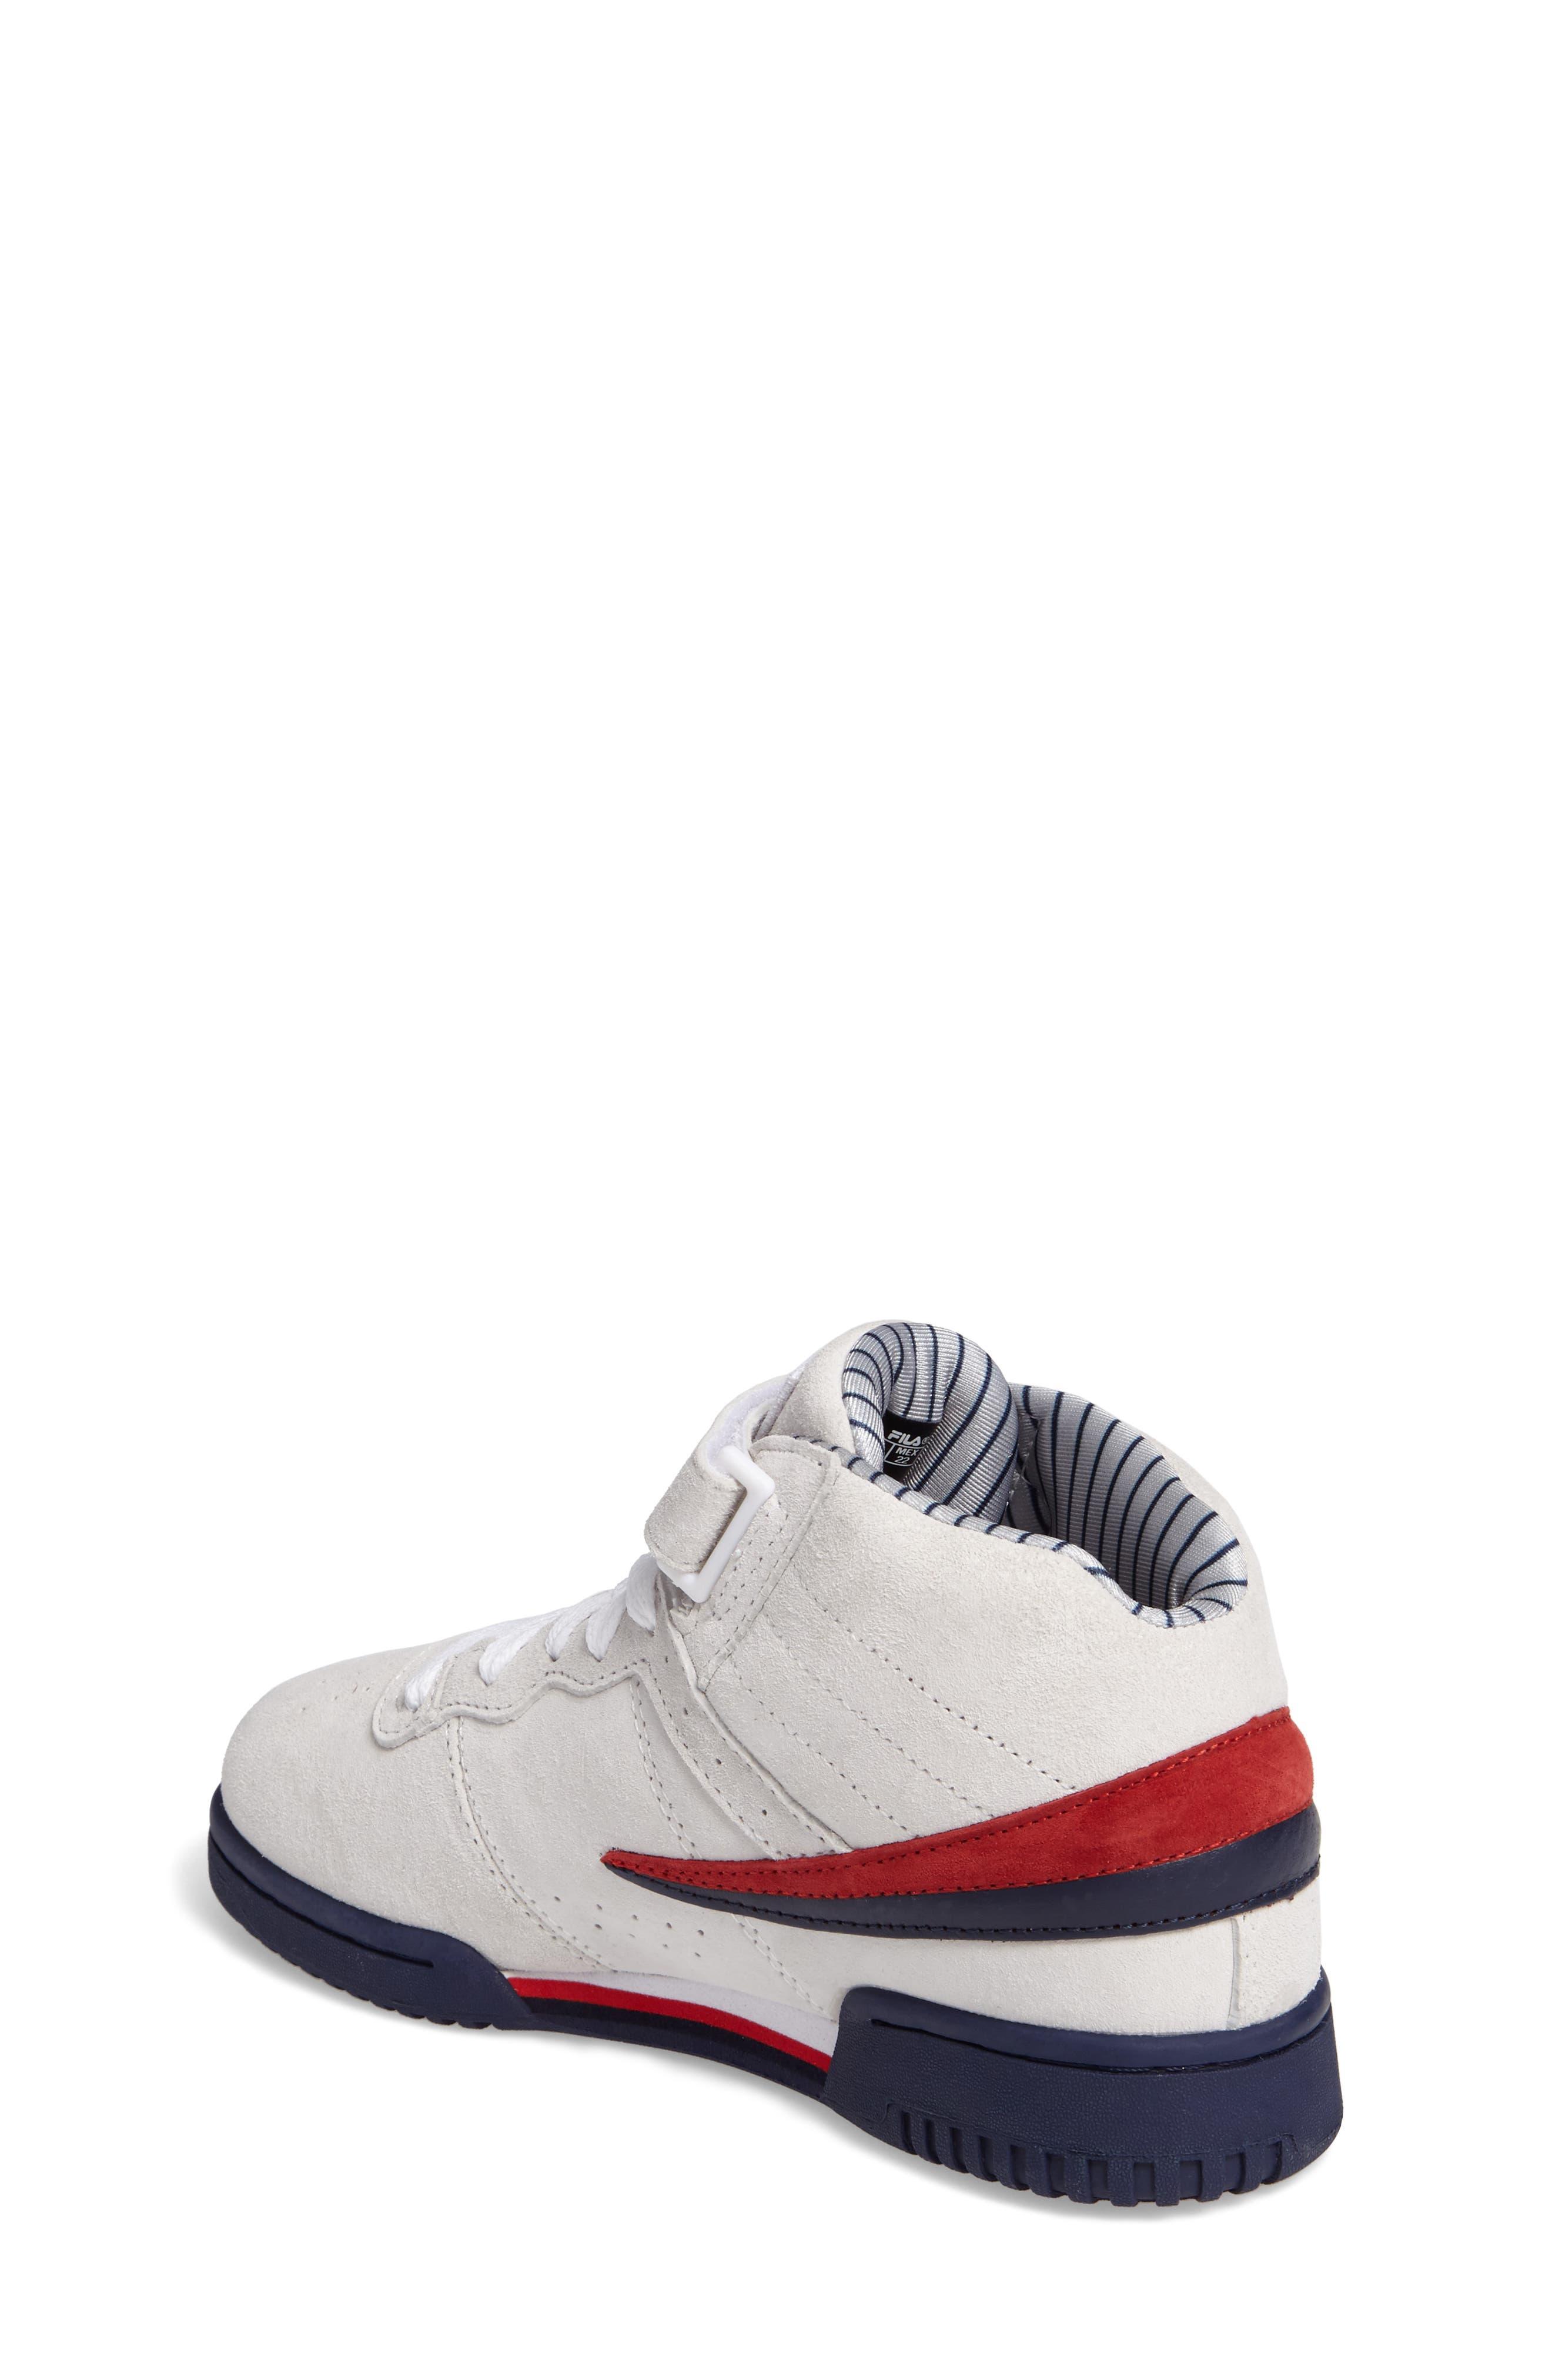 FILA, F-13 Mid Pinstripe Sneaker, Alternate thumbnail 2, color, 150